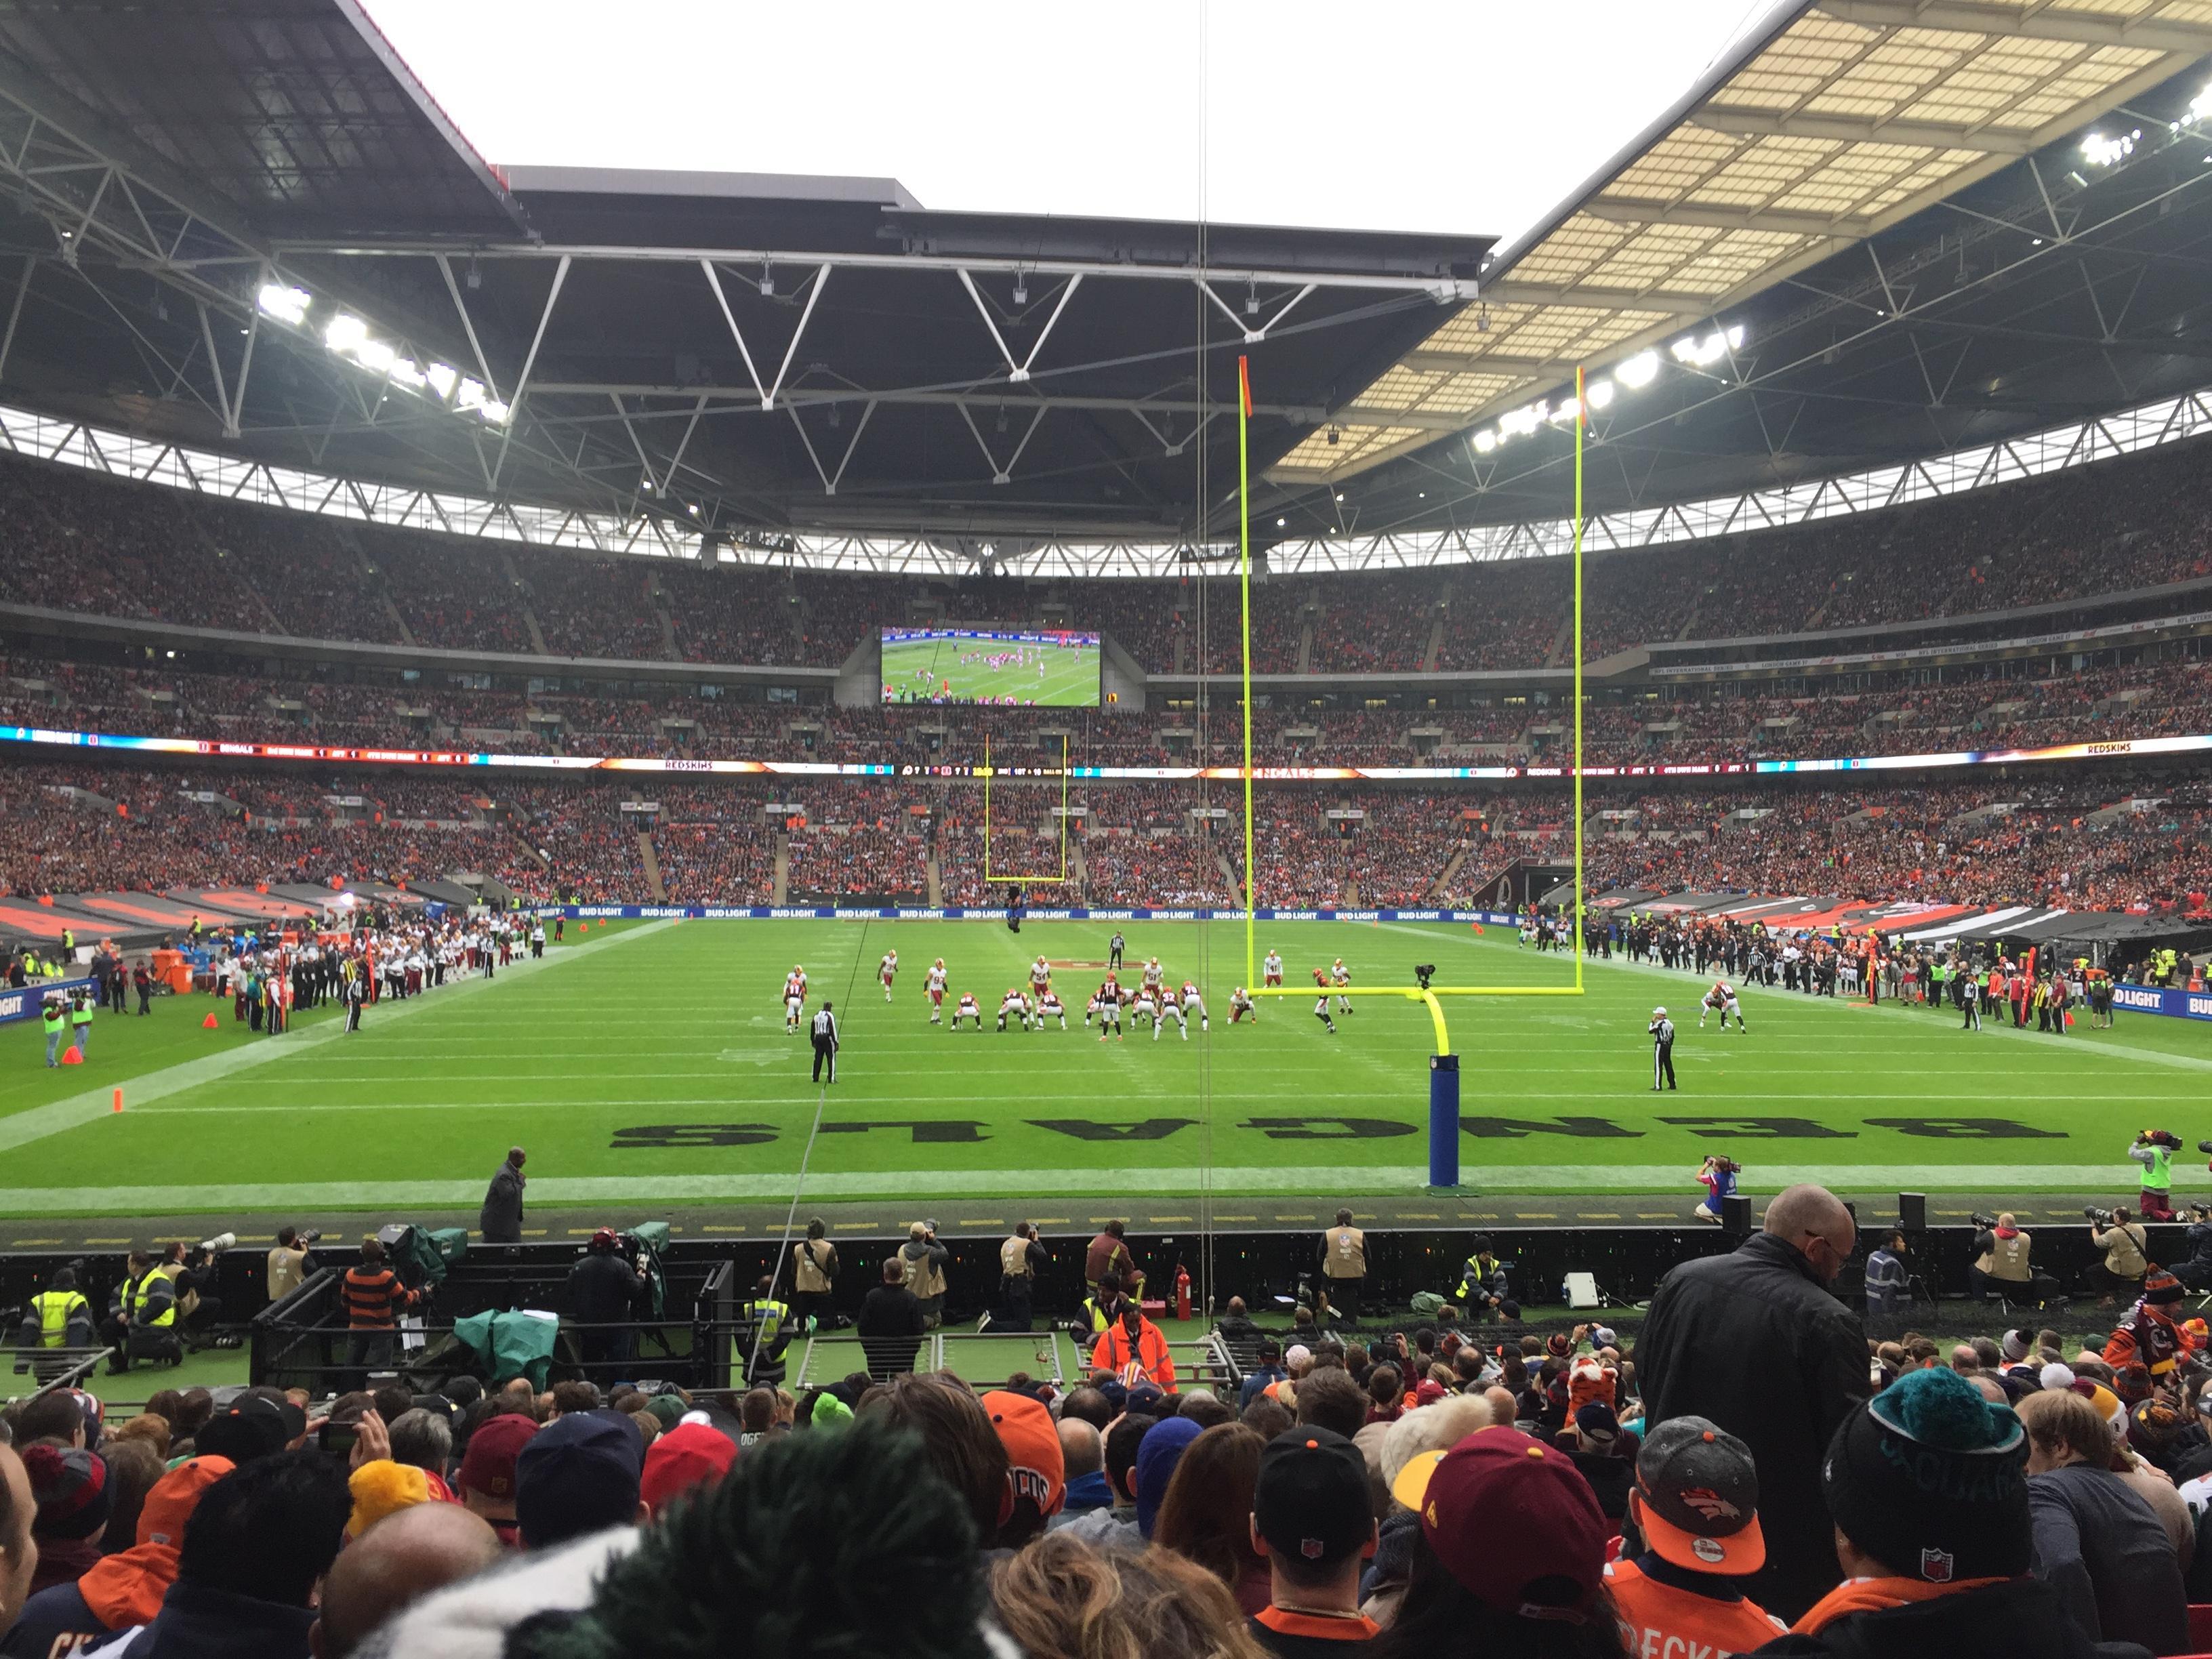 Wembley Stadium Section 112 Row 22 Seat 19